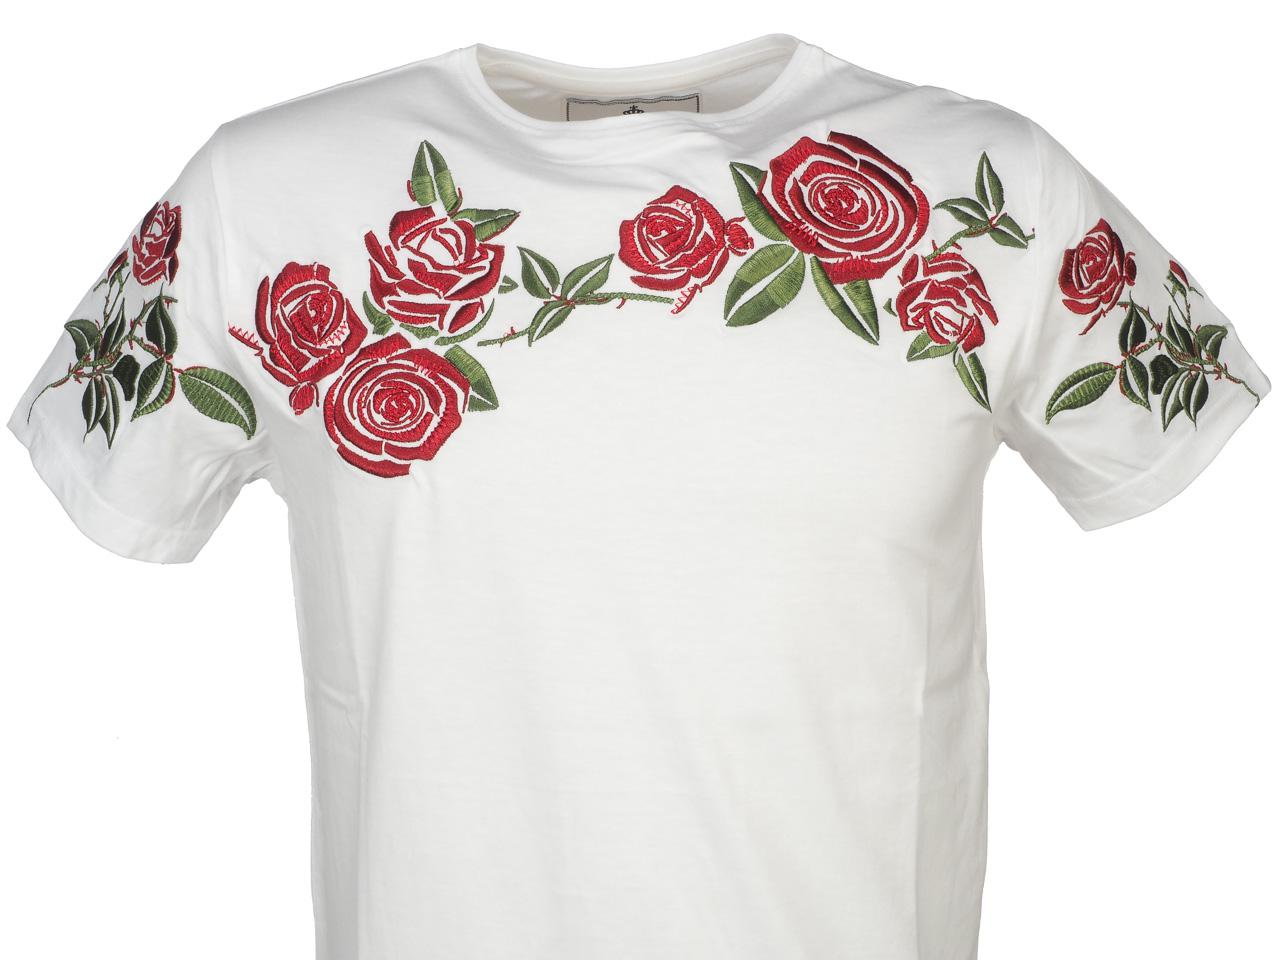 Short-Sleeve-T-Shirt-Hite-Couture-Madiner-White-Mc-Tee-White-11526-New thumbnail 2